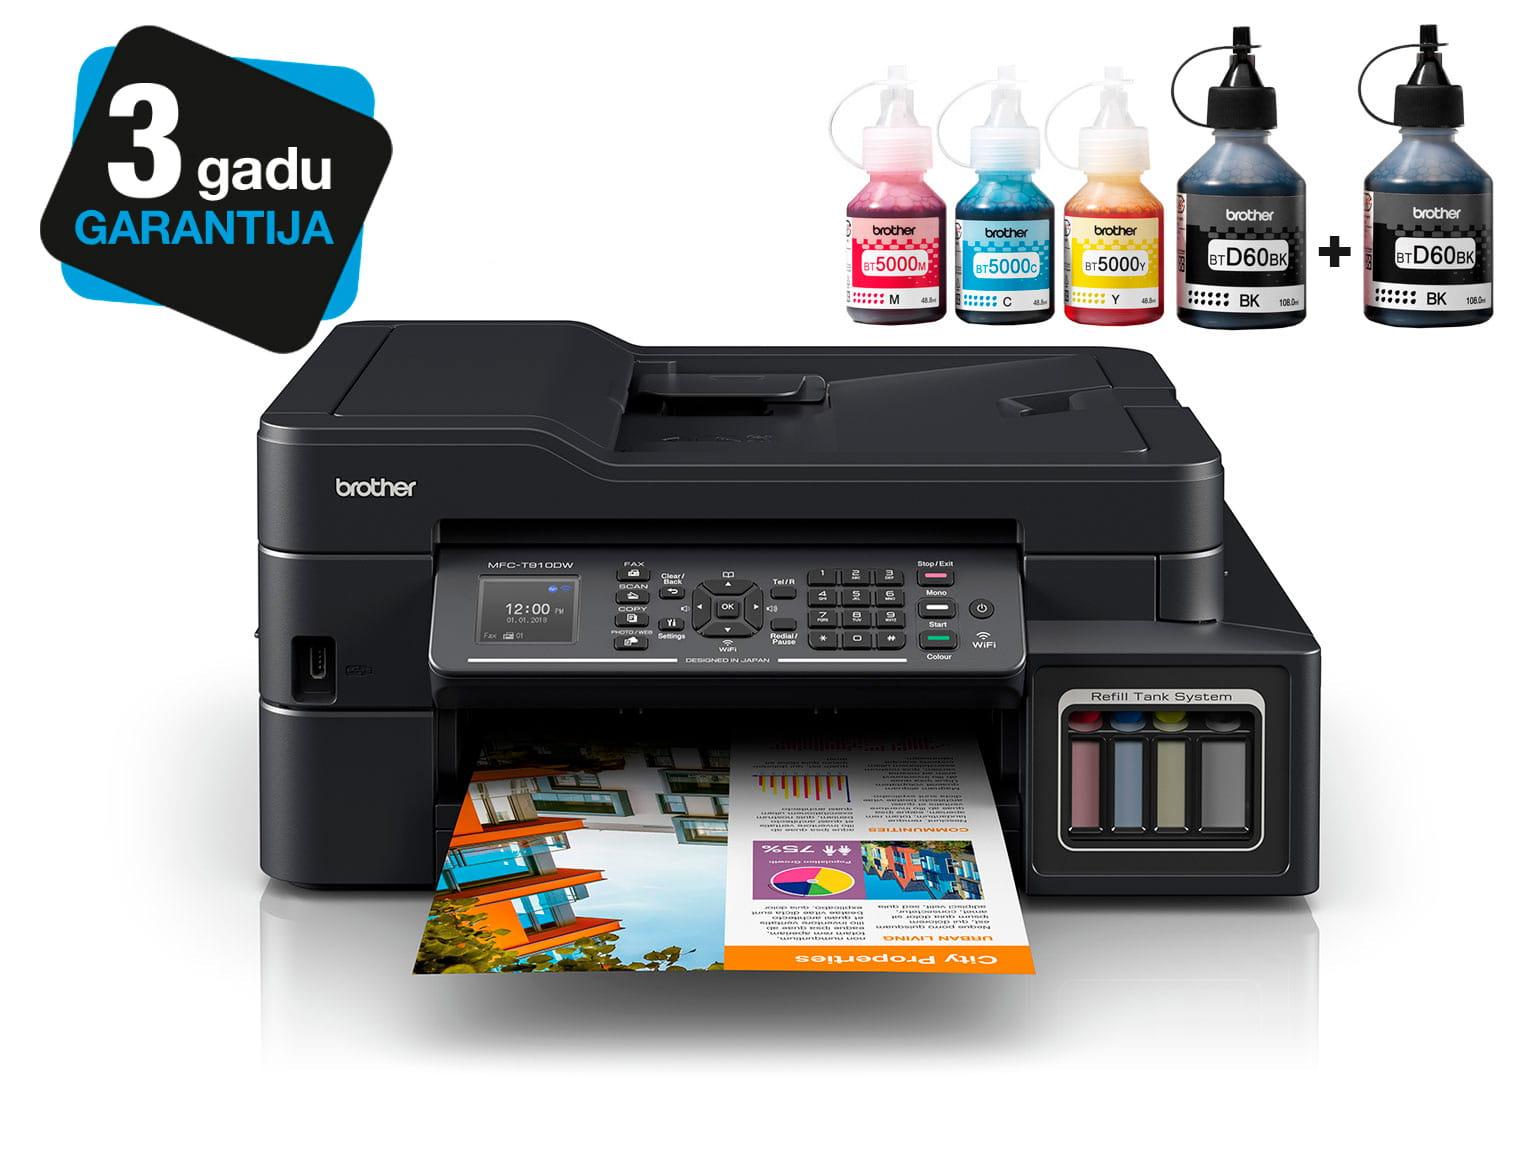 Brother InkBenefit Plus tintes printeris MFC-T910DW